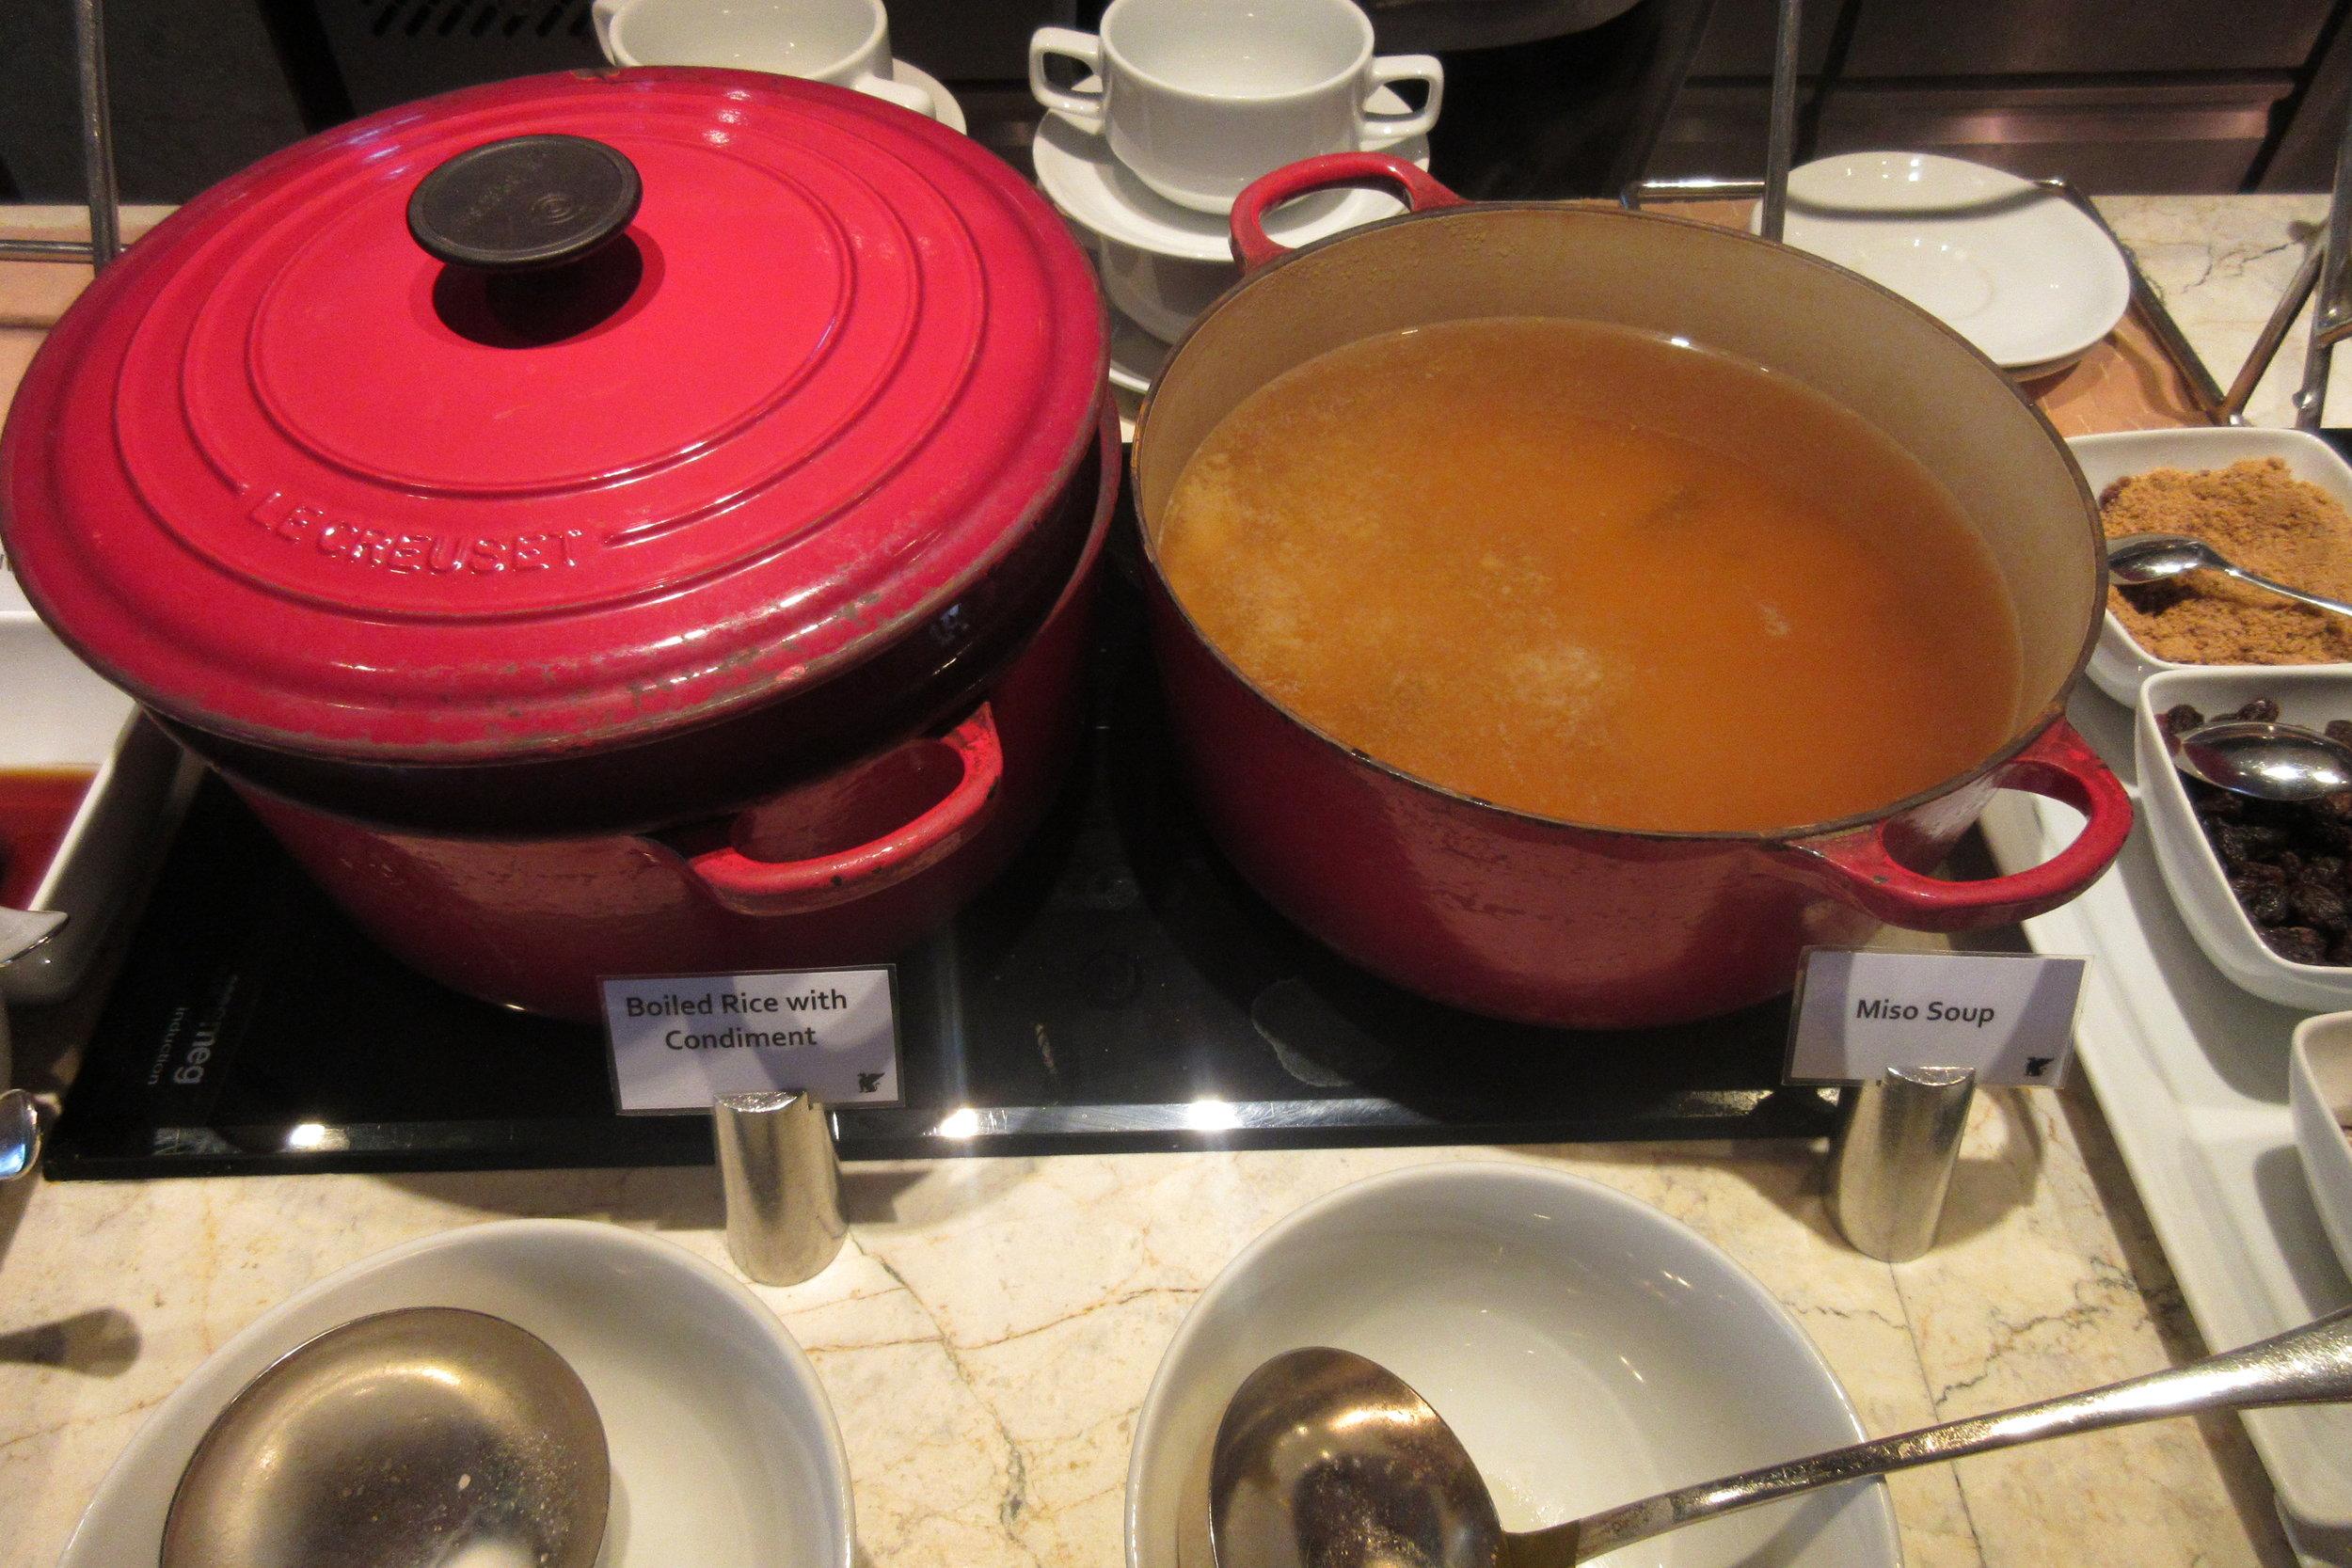 JW Marriott Bangkok – Miso soup